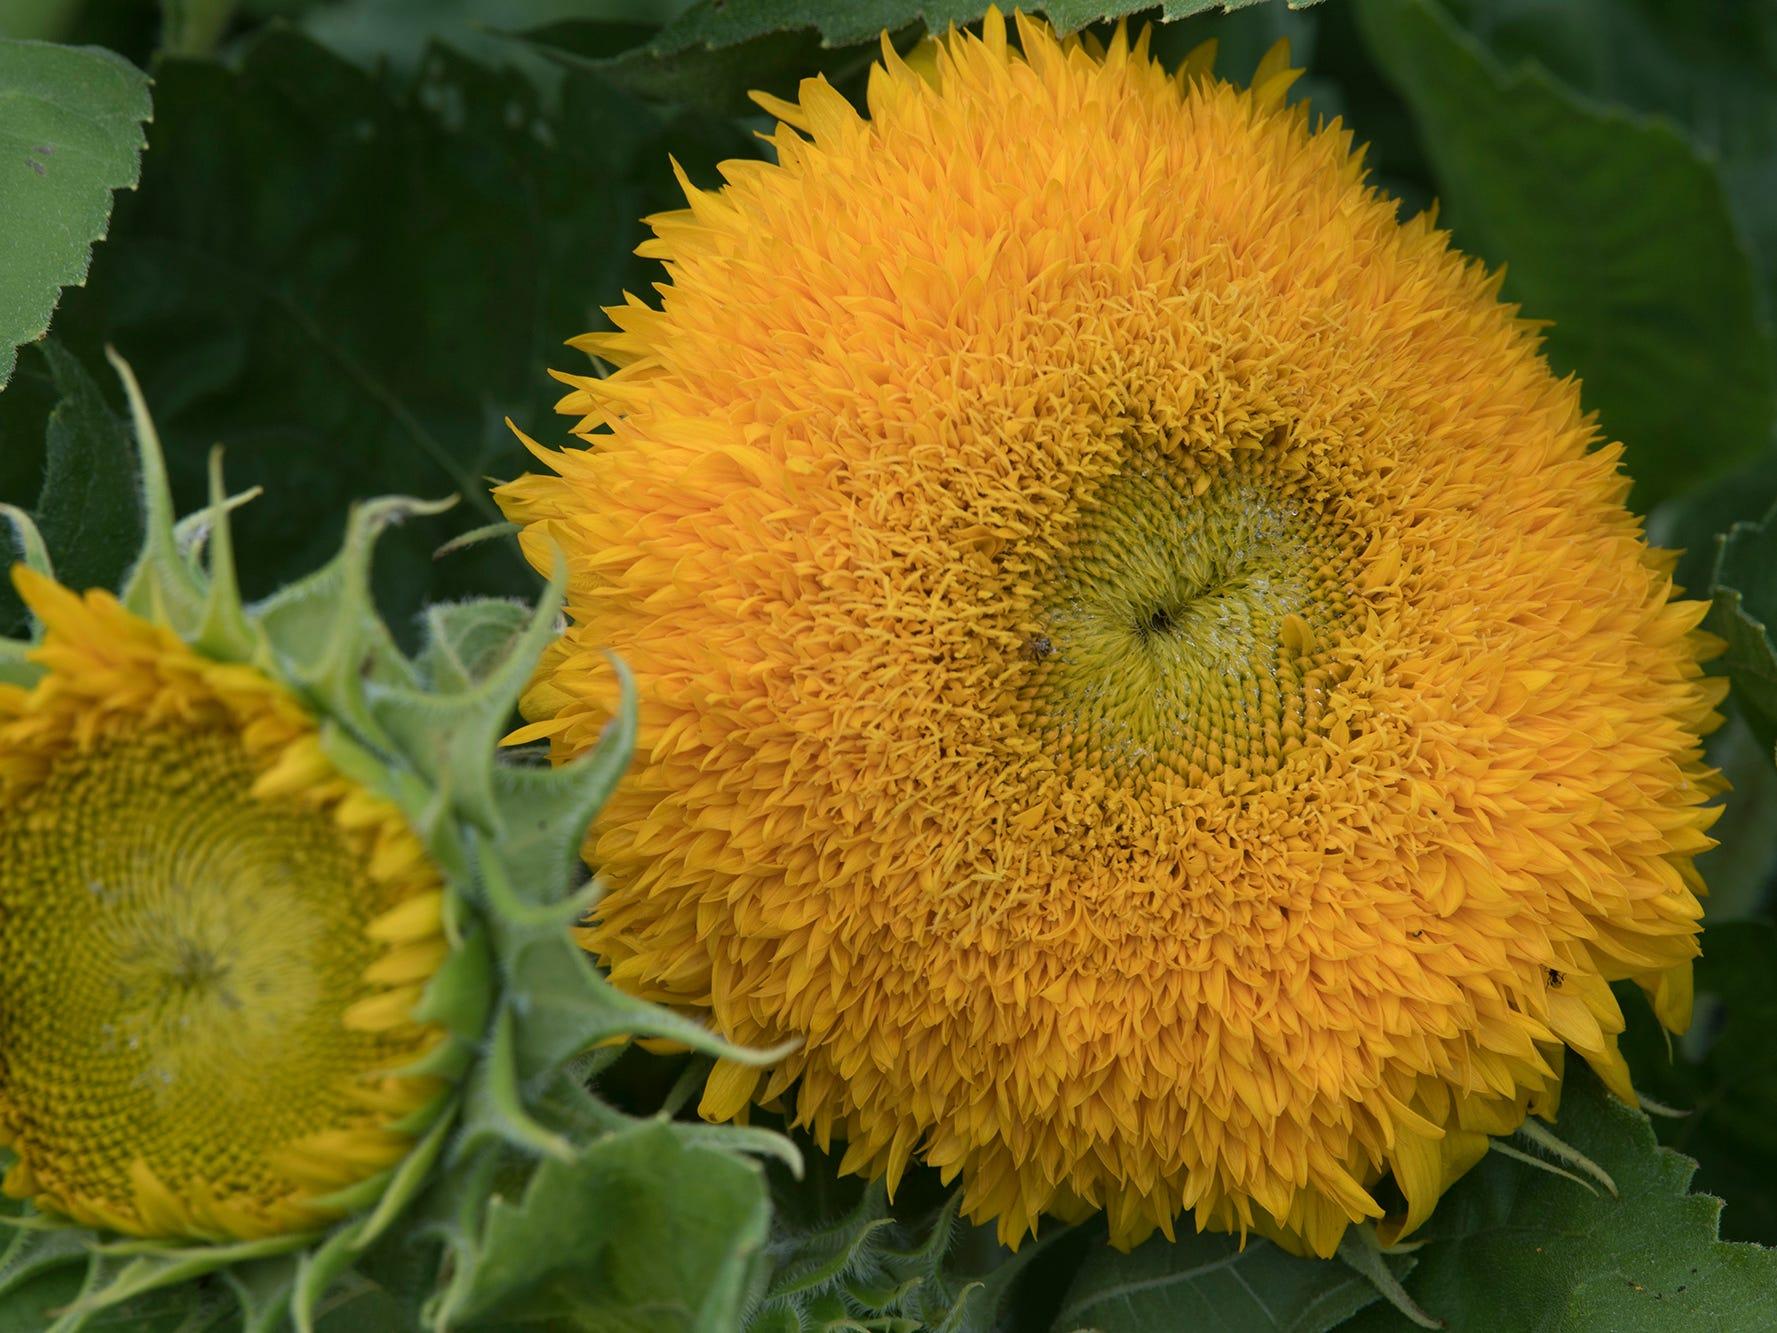 A Dwarf Teddy Bear sunflower during the 2nd Annual Sunflower Festival at Maple Lawn Farms near New Park.